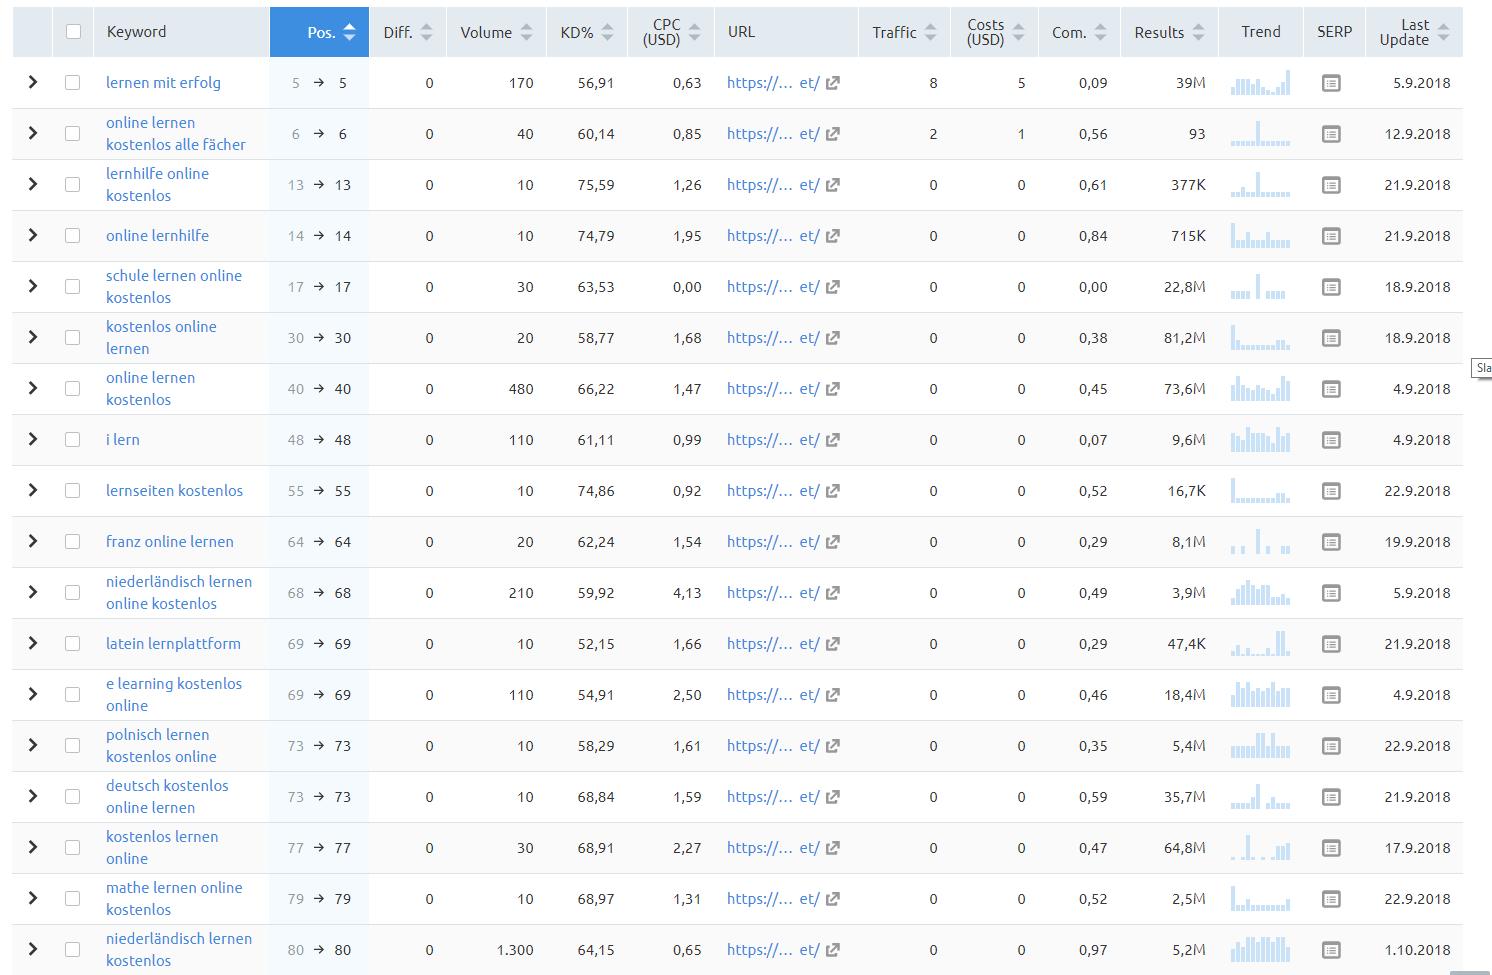 webseite-check-keyword-analyse-google